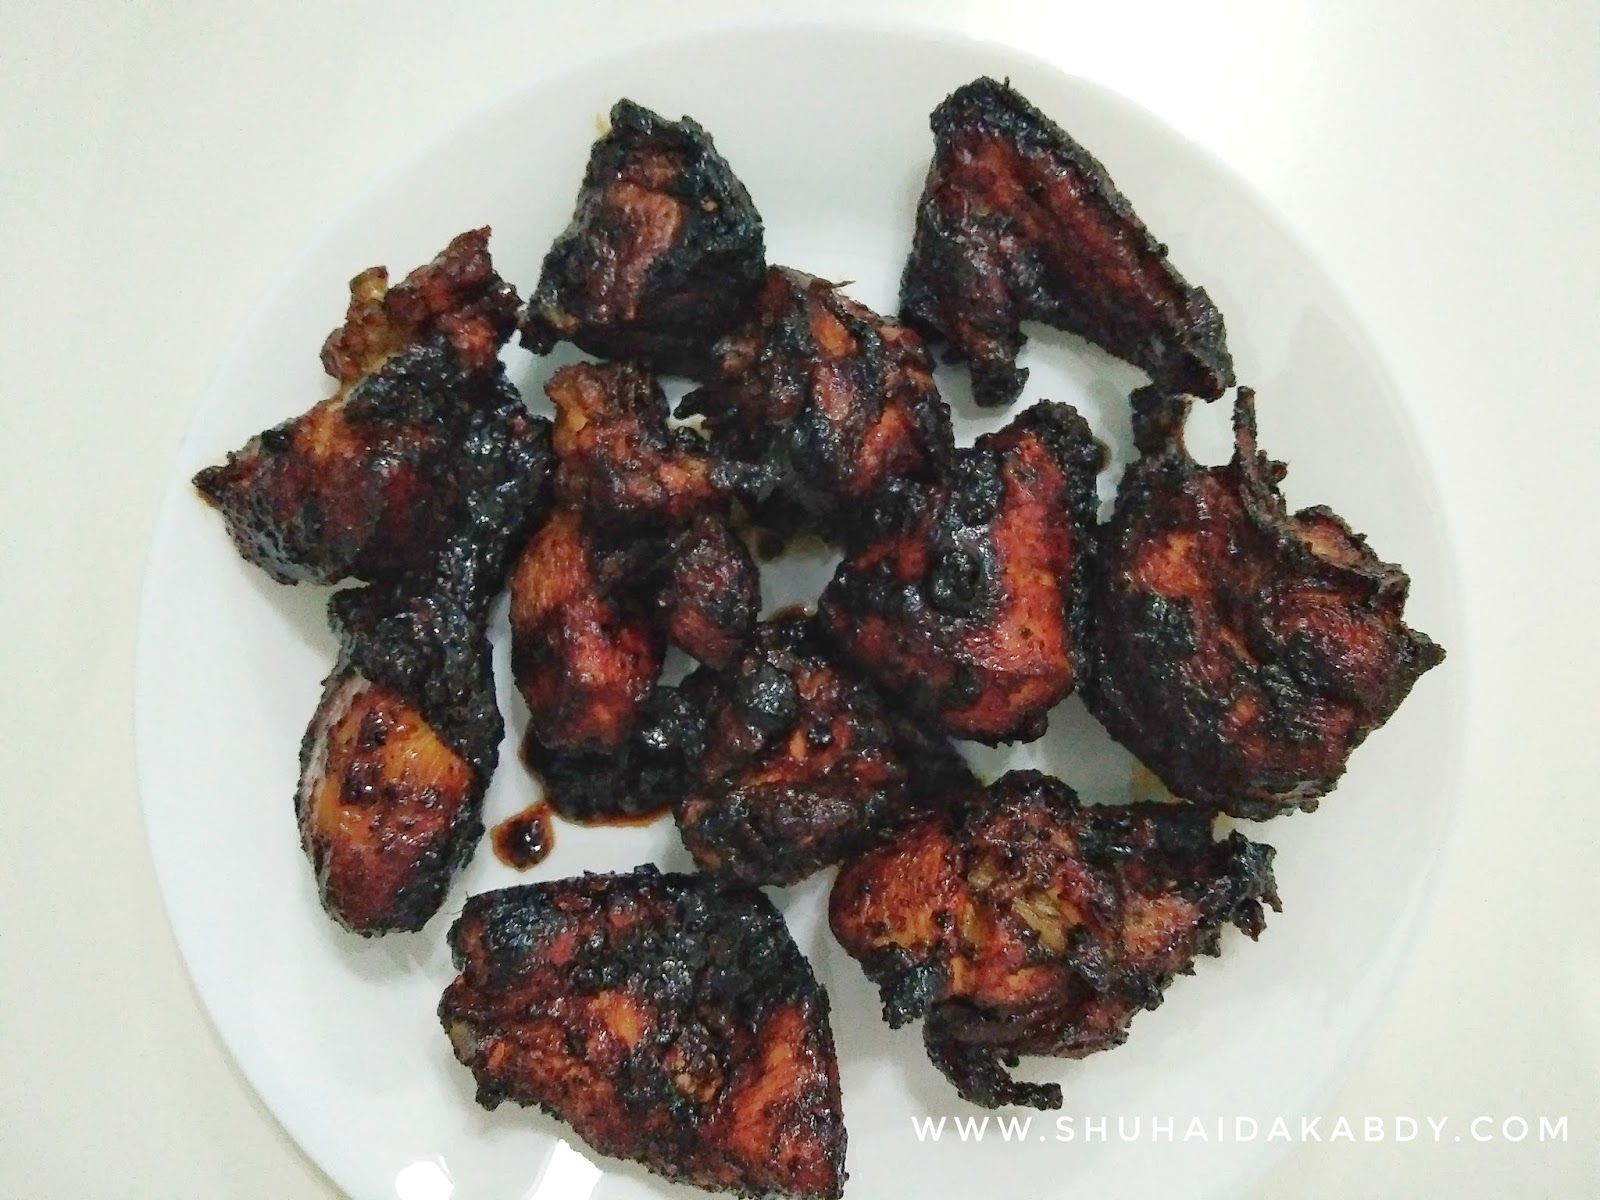 Resepi Ayam Teriyaki Versi MamaPipie